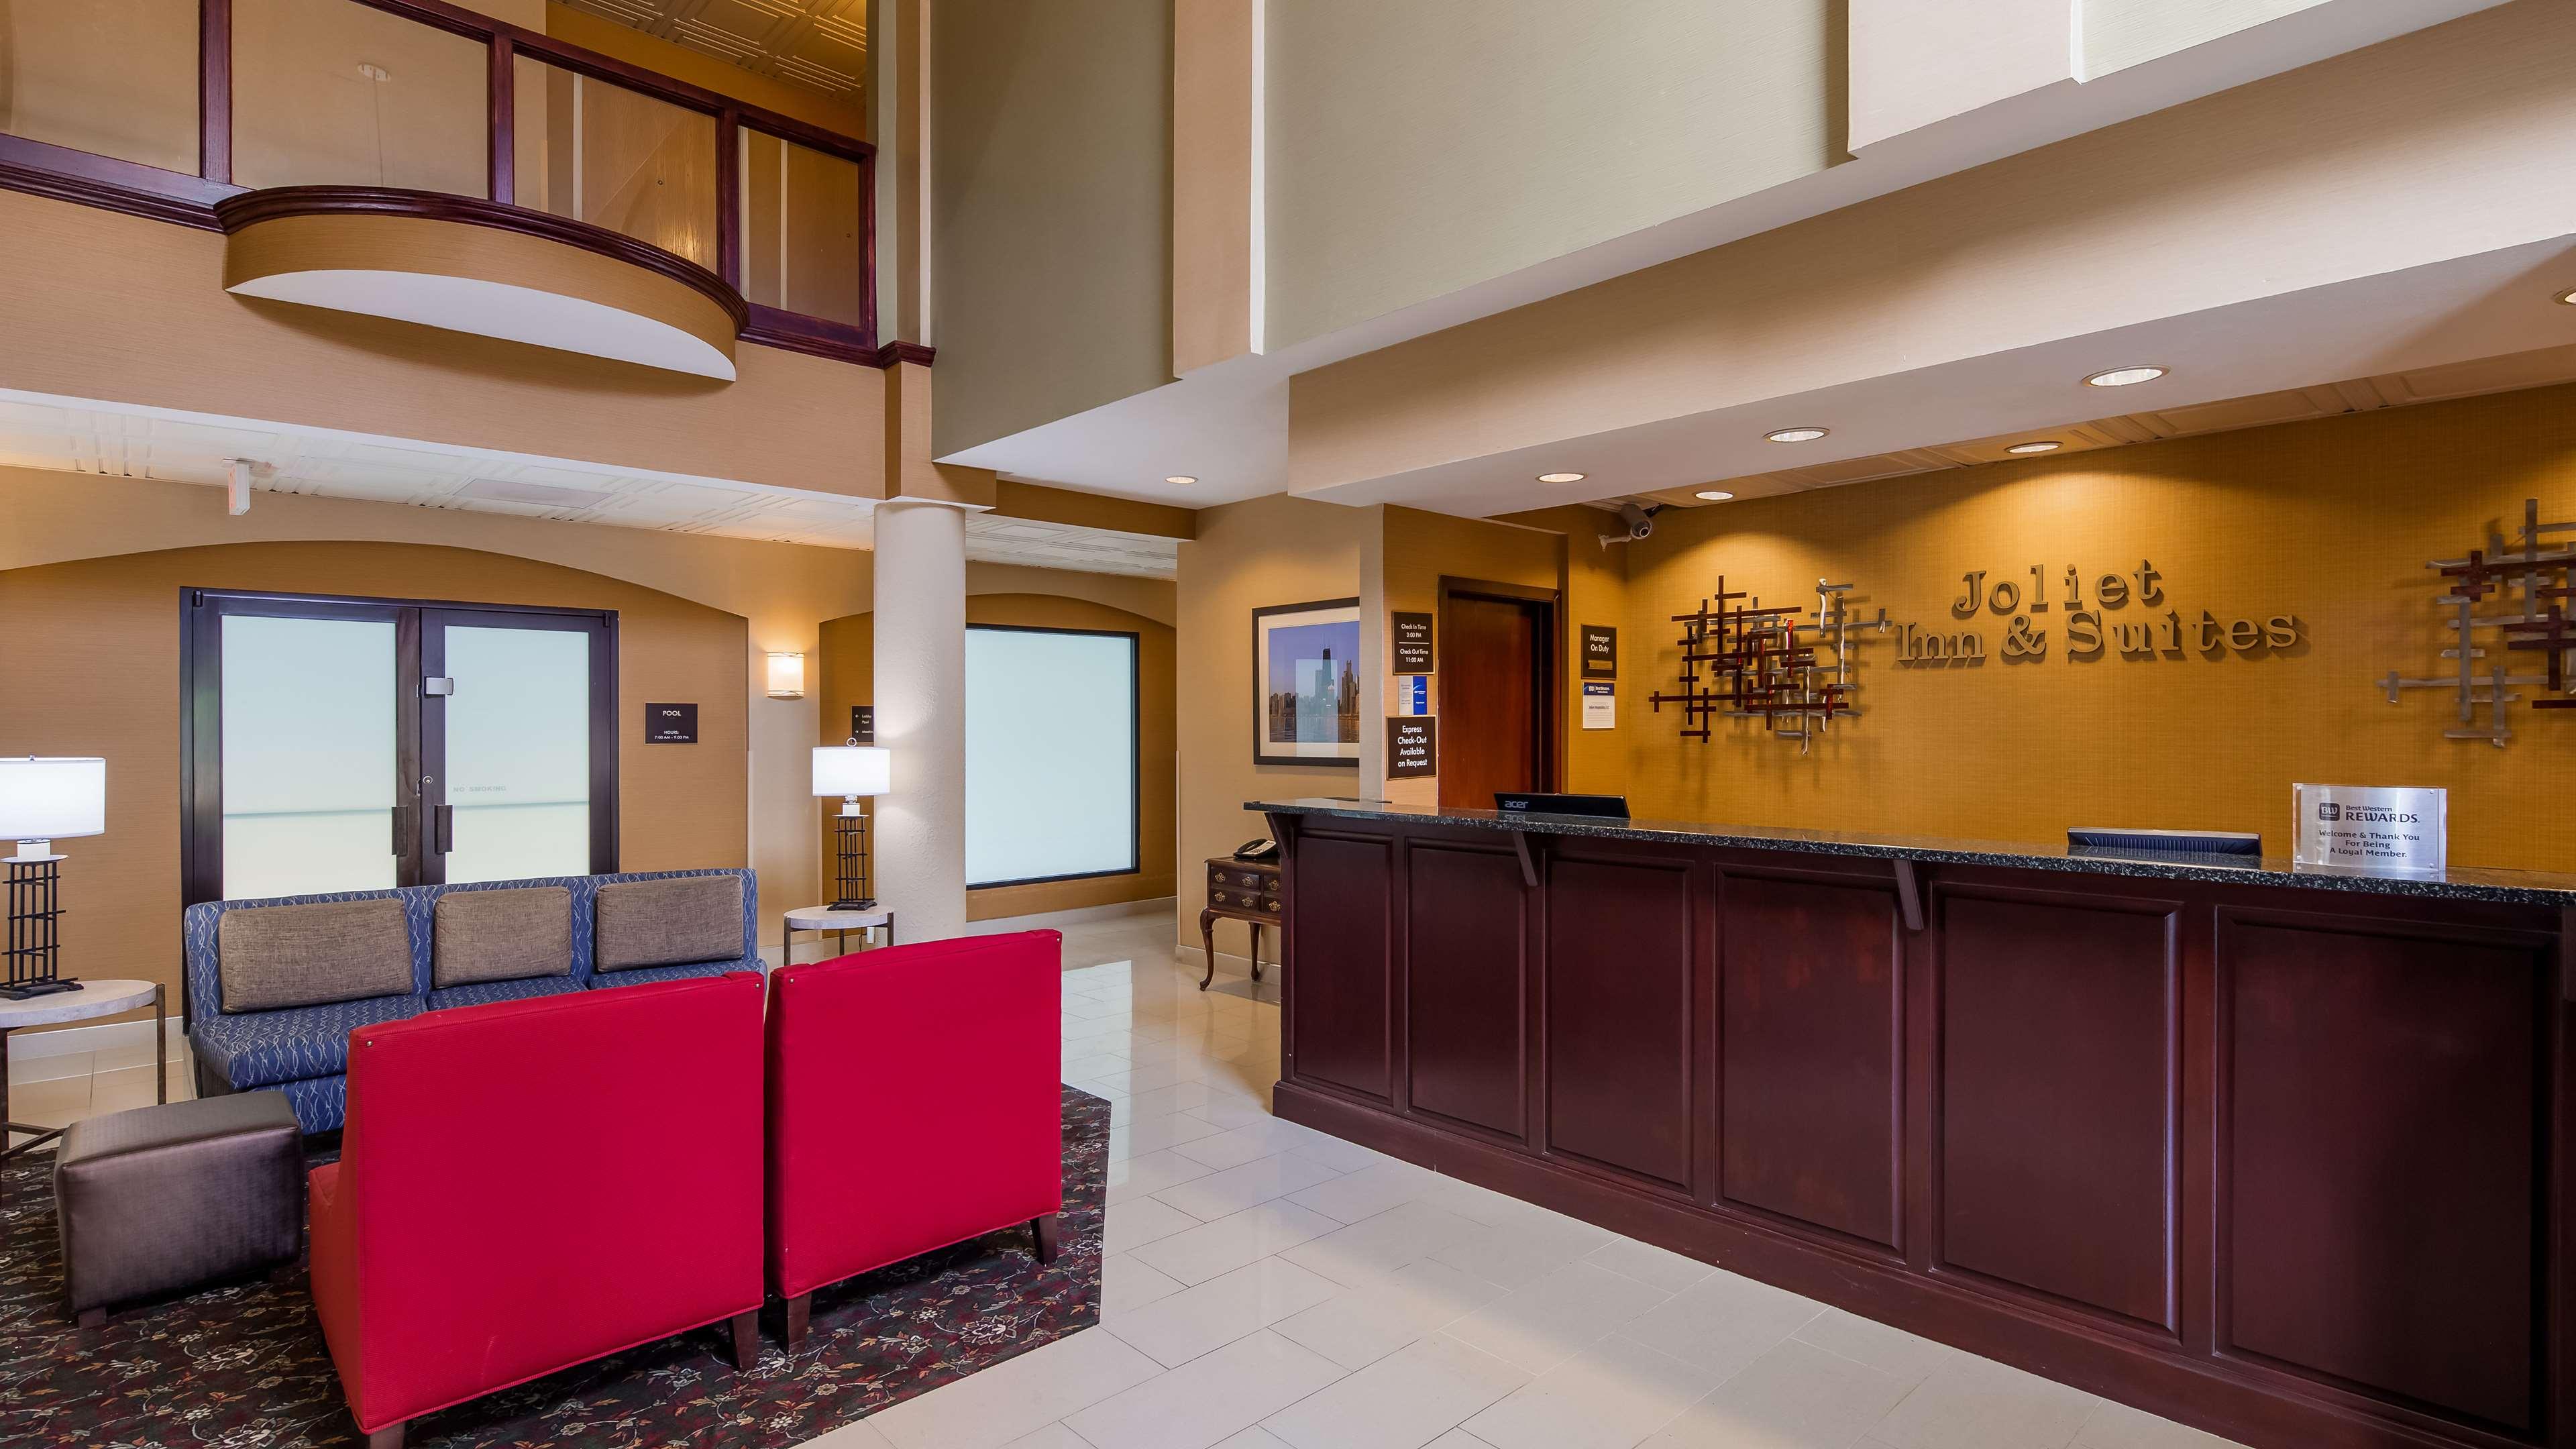 Best Western Joliet Inn & Suites image 2